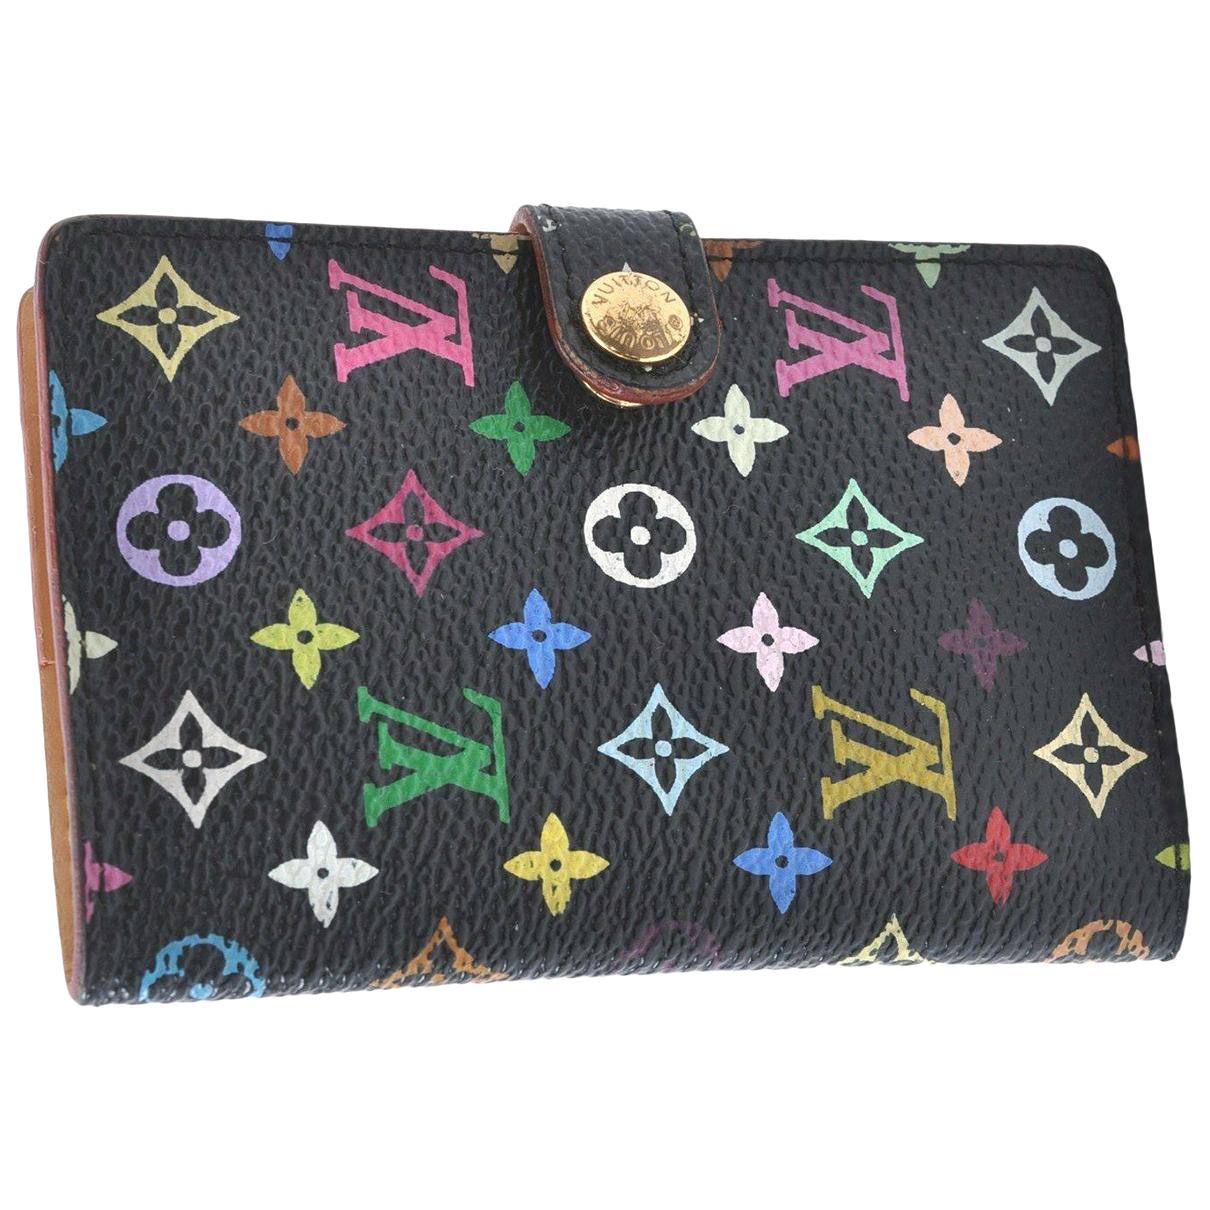 Louis Vuitton N Black Cloth Purses, wallet & cases for Women N